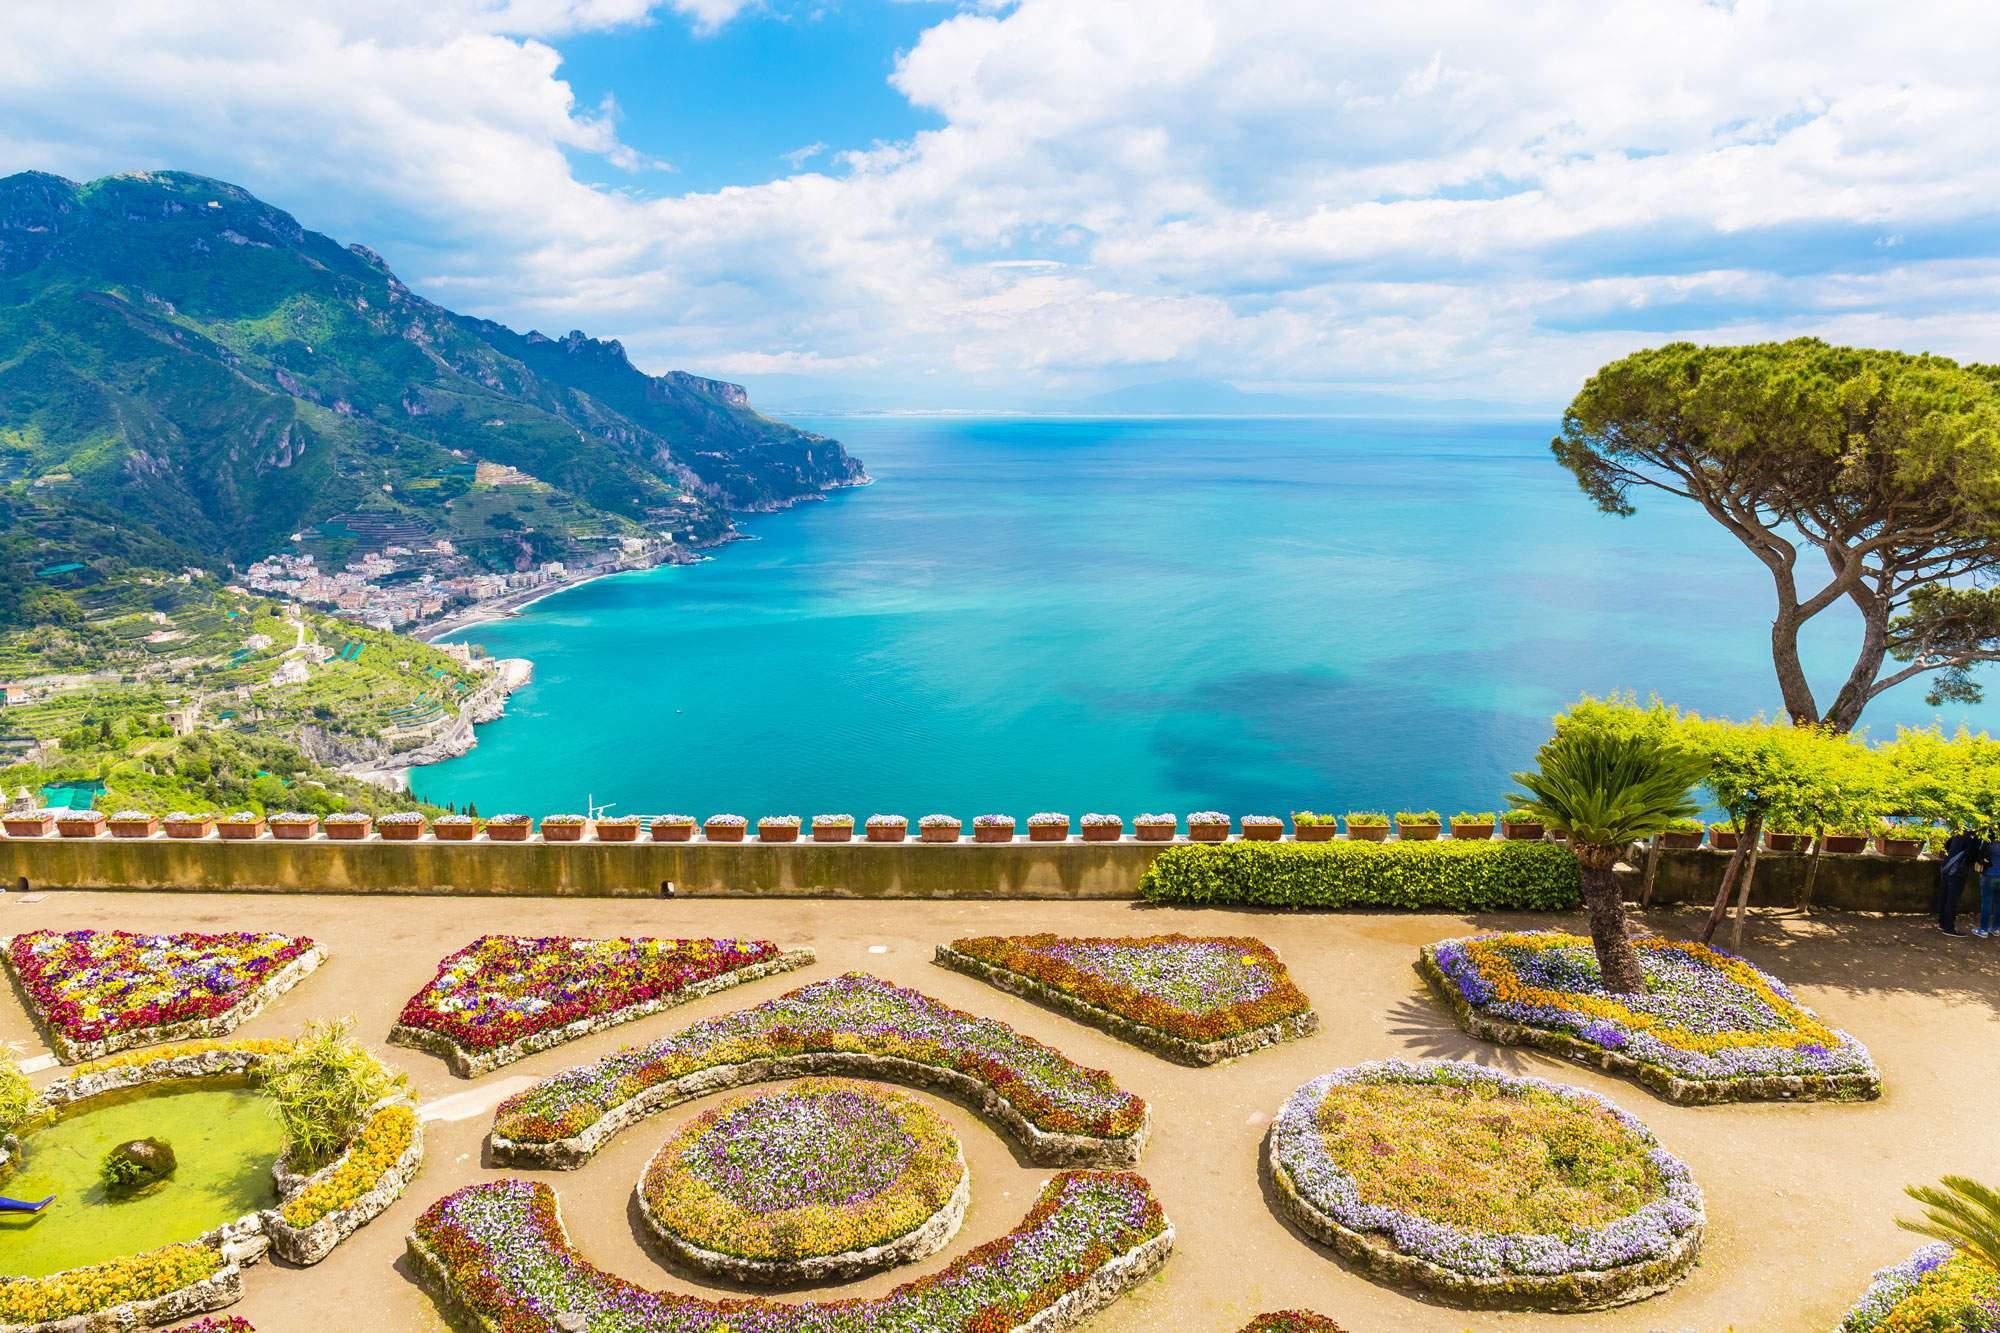 ravello-amalfi-italy-festival-garden-views